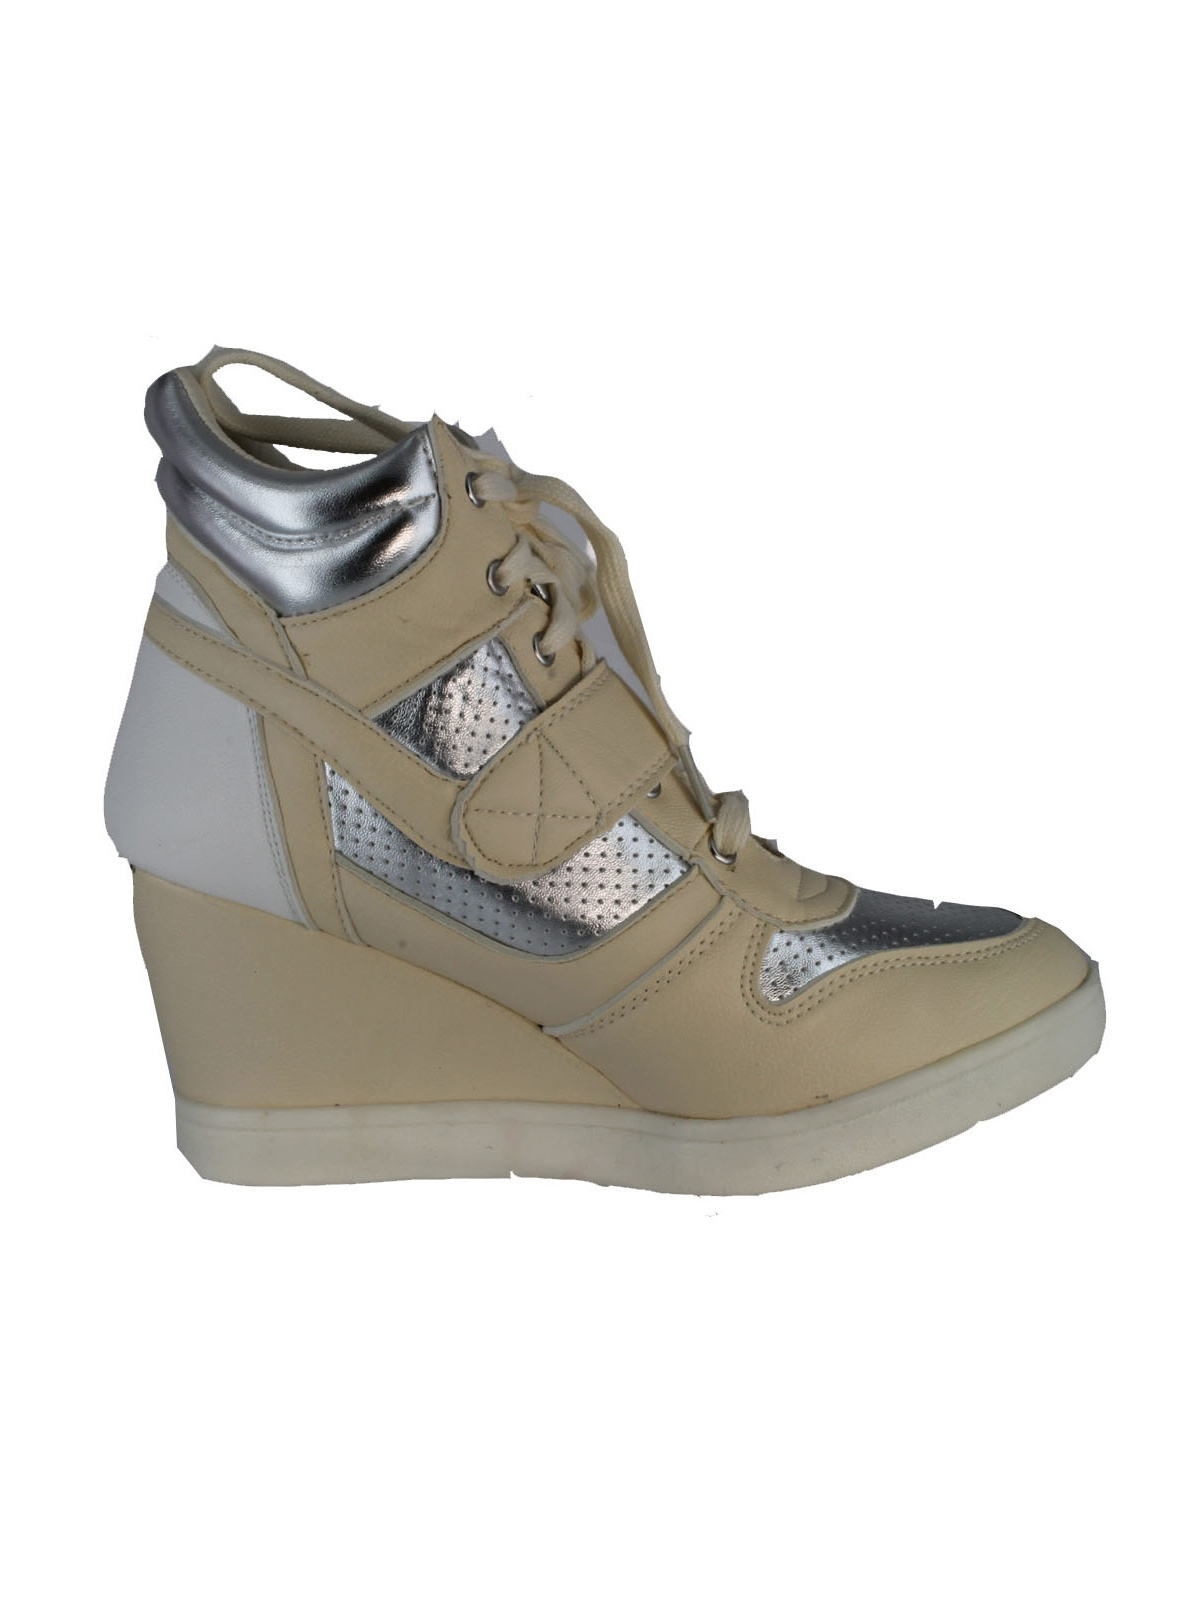 Qupid SELMA-01 Lace Up High Top Velcro Wedge Heel Sneaker